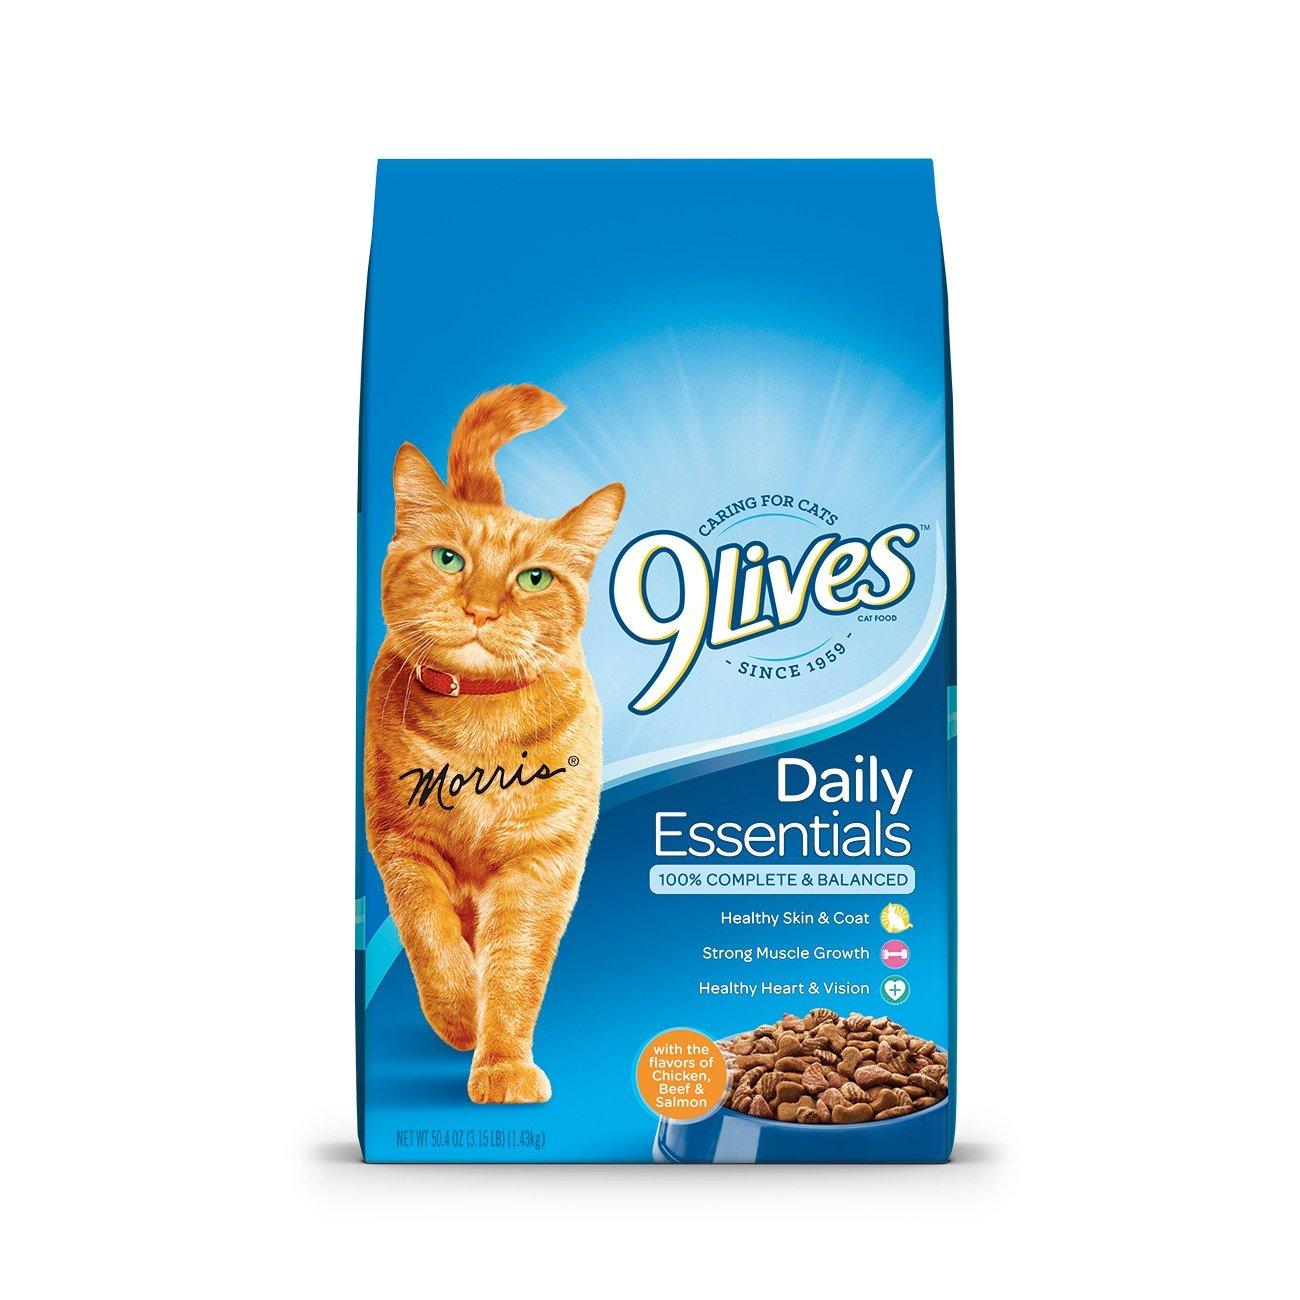 Nine Lives Daily Essentials Cat Food